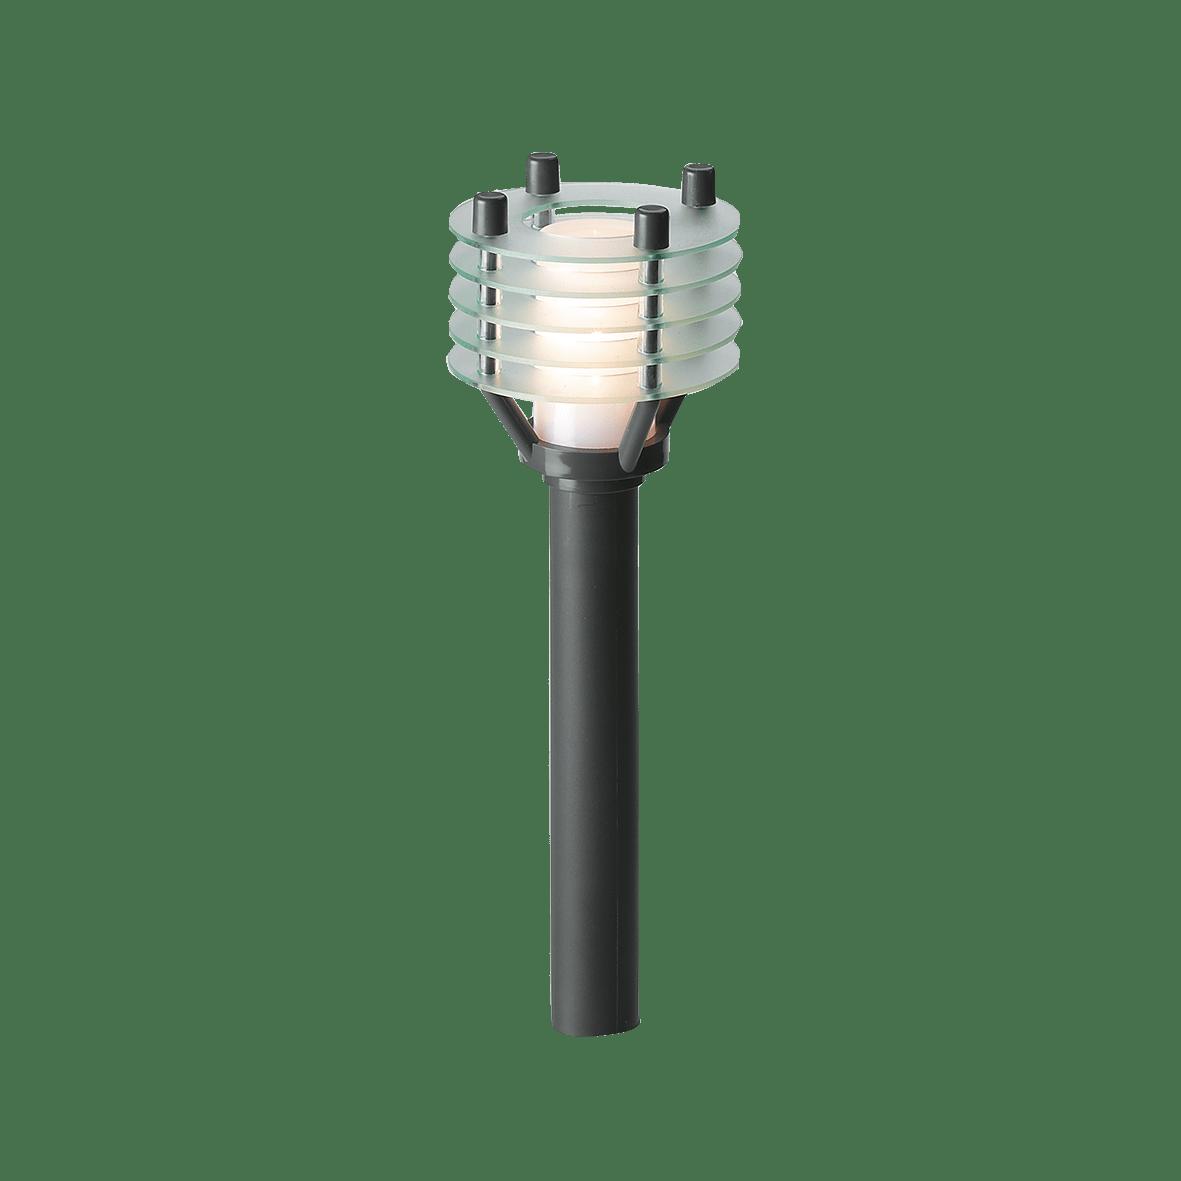 Garden Lights Tuinlamp Larix LED | Stijlvolle Tuinlamp